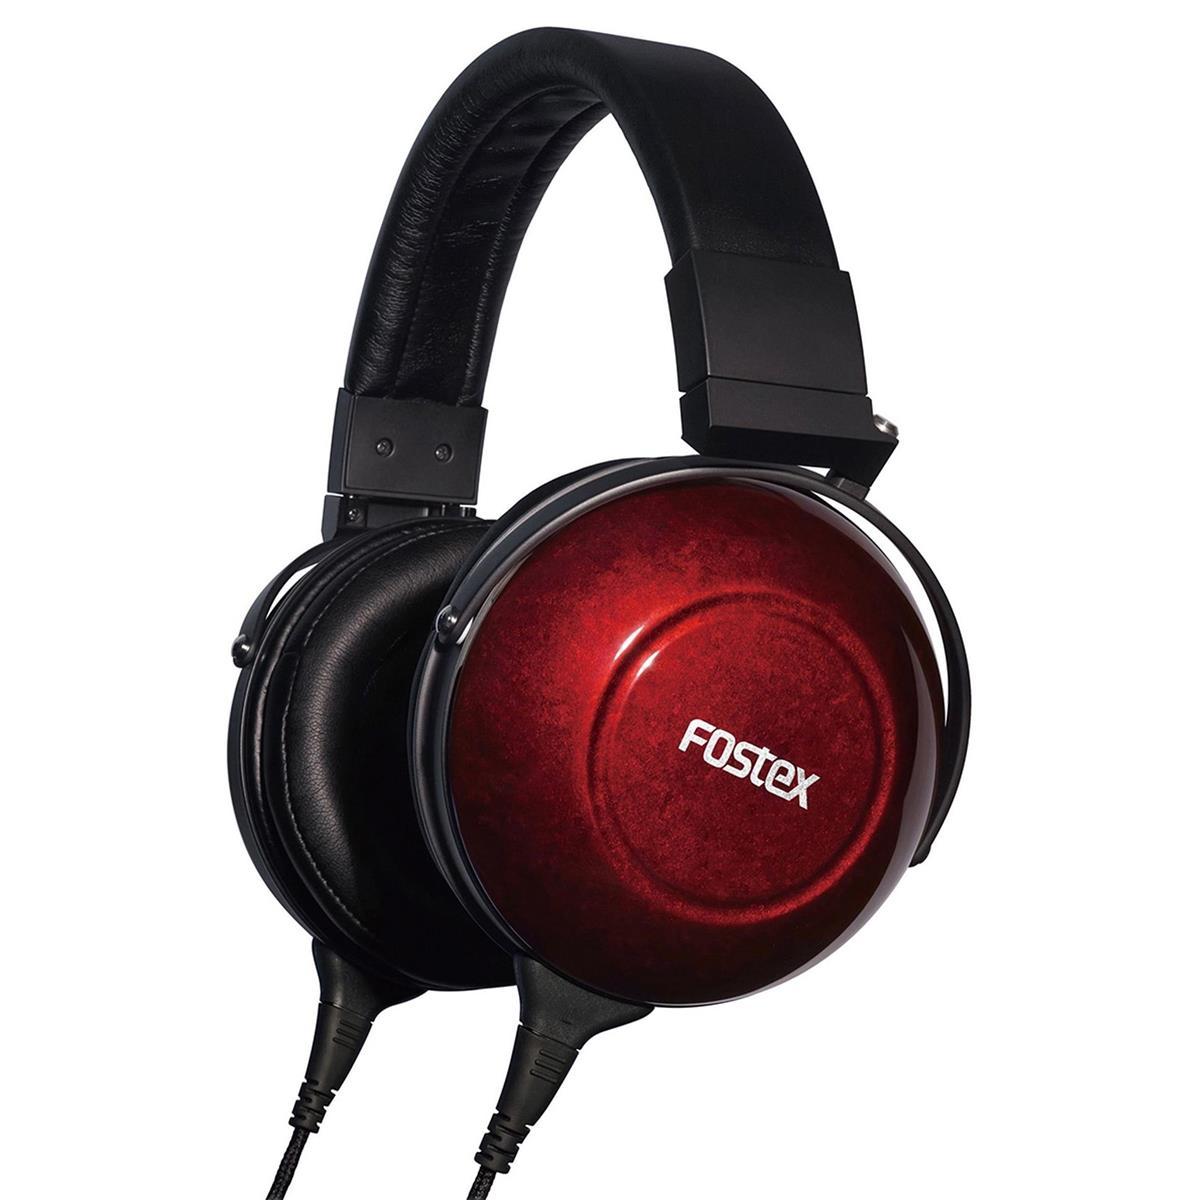 Fostex TH-900mk2 Premium 1.5 Tesla Stereo Headphones $999.99 fs @ adorama